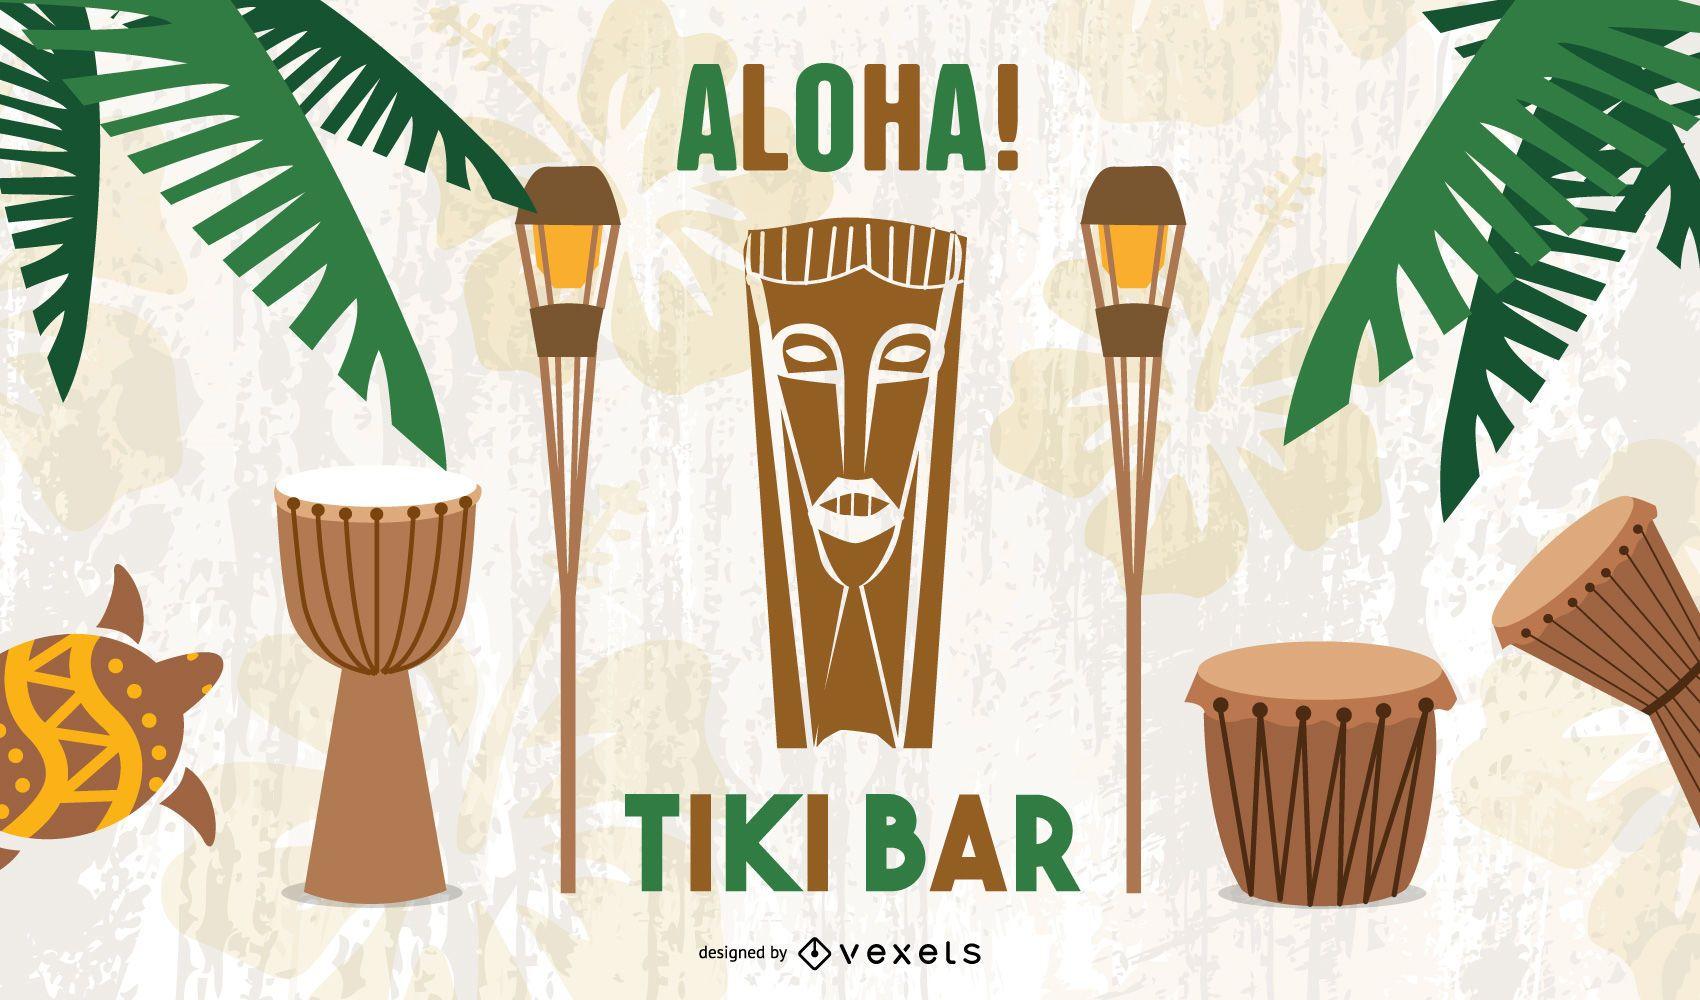 Póster Tiki Bar Retro Aloha